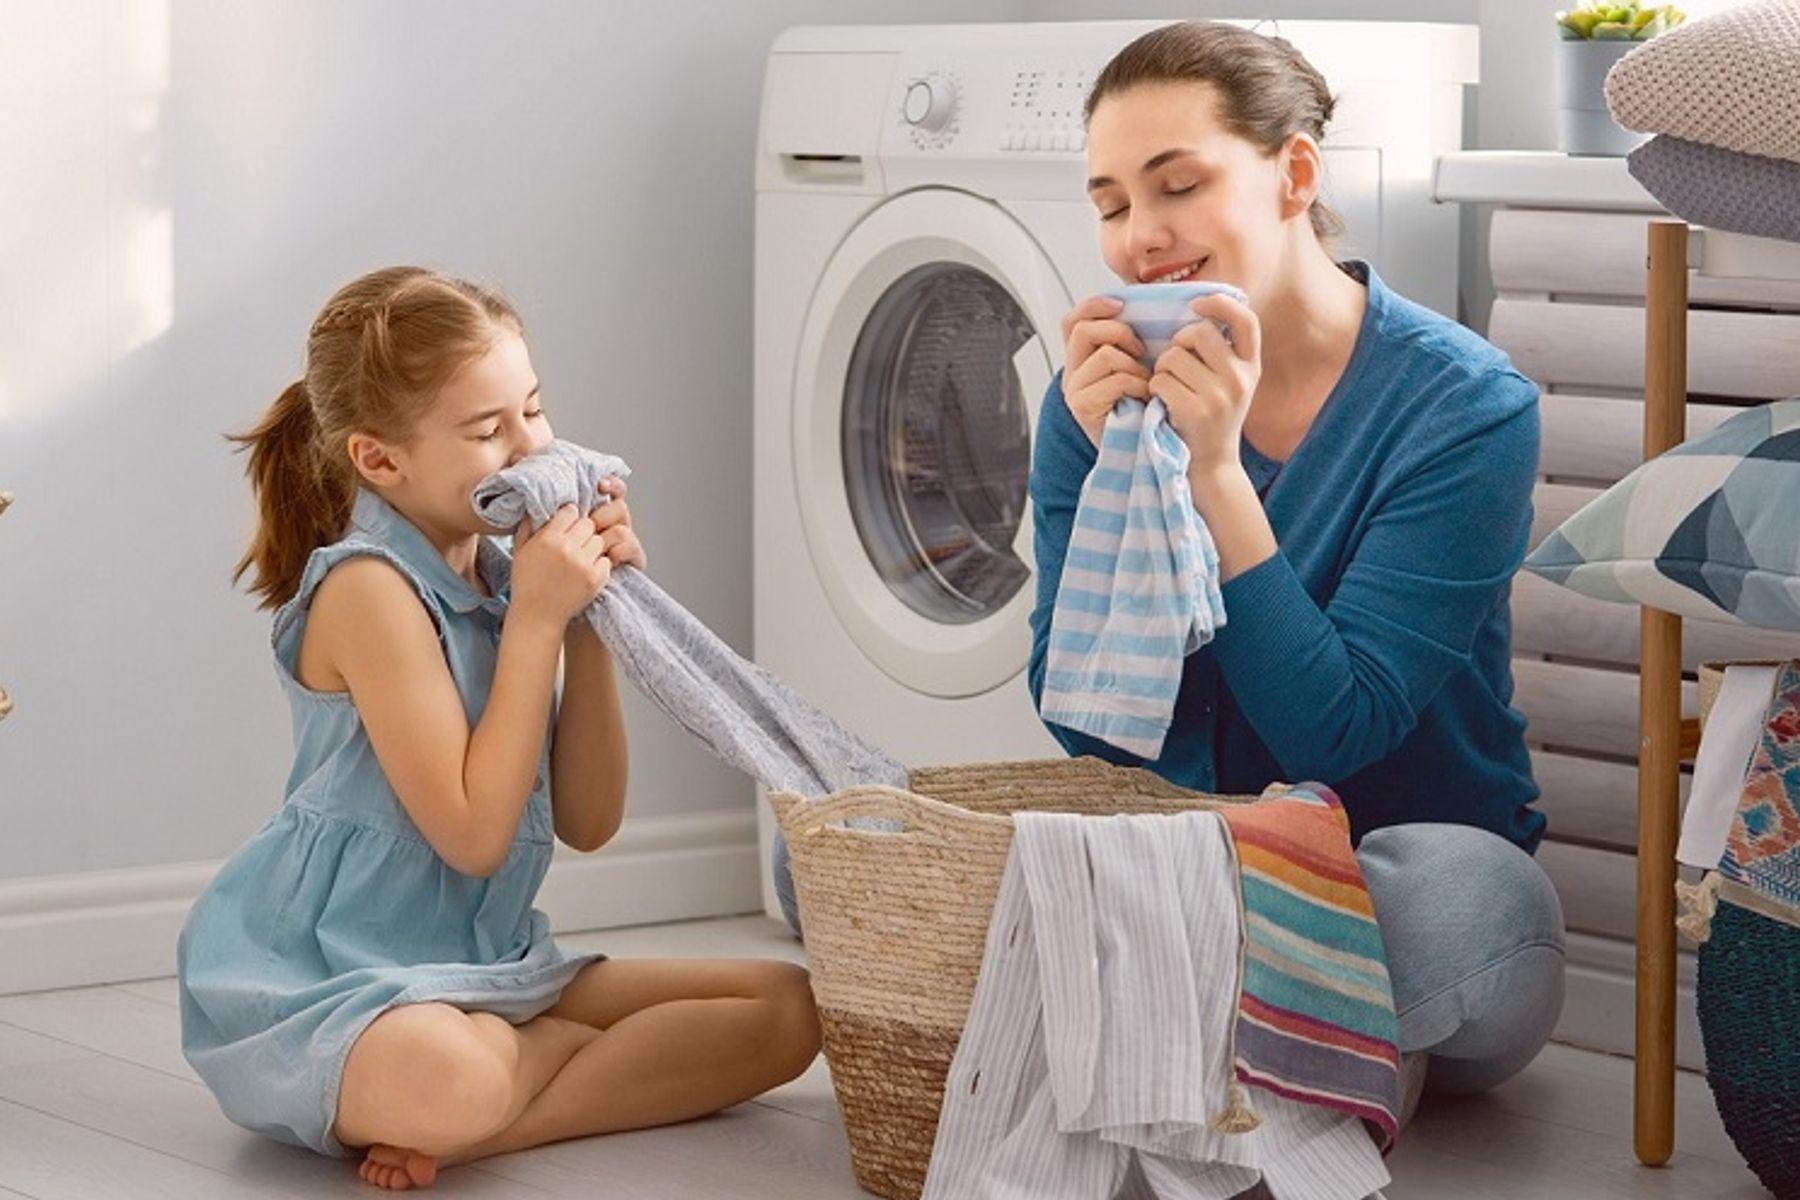 Cách giặt quần áo thơm lâu bằng máy giặt